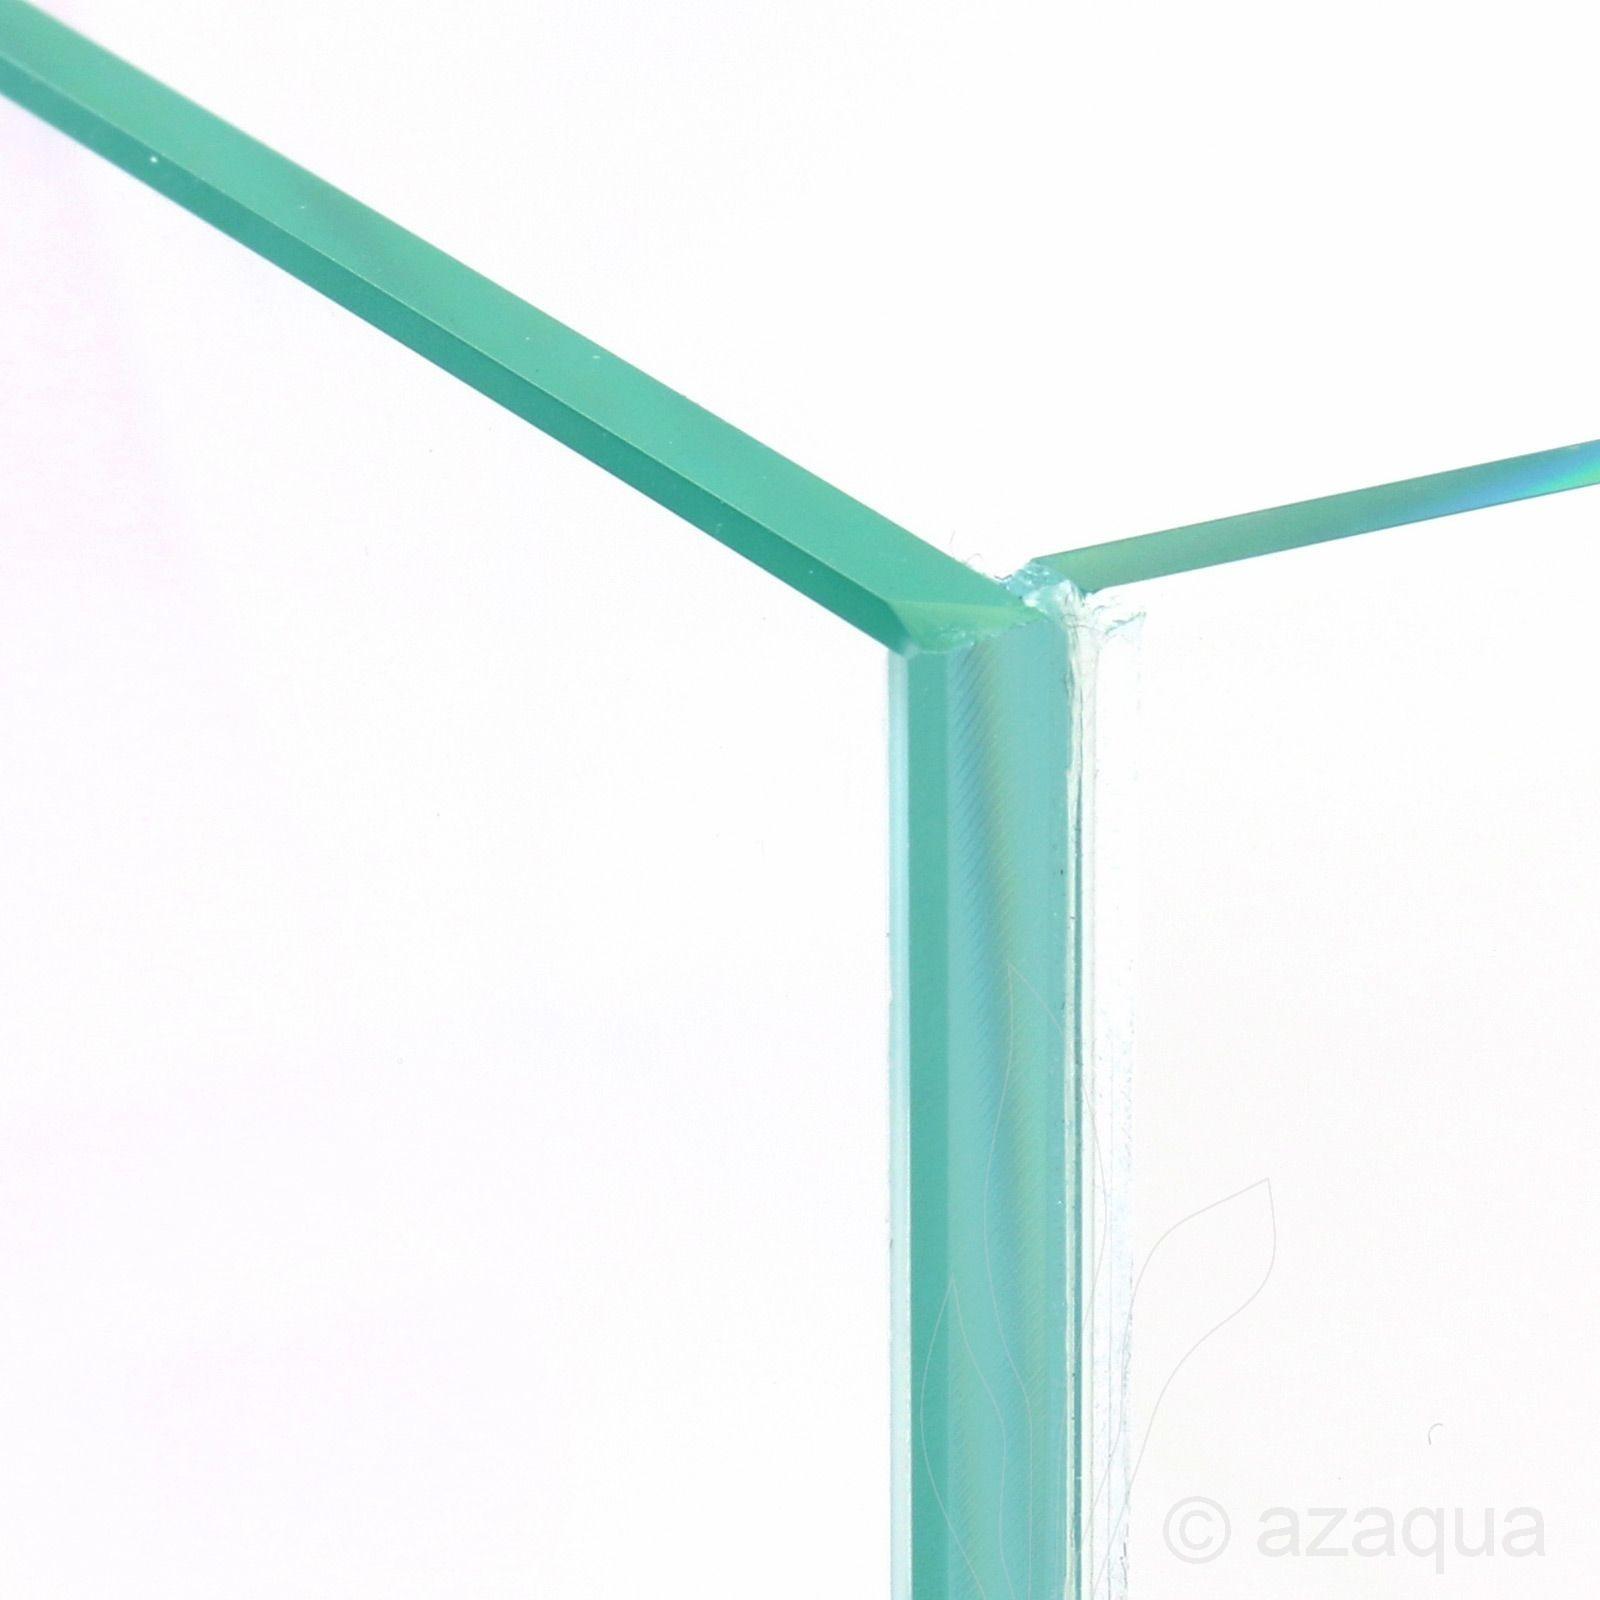 ILA Cubic (60x60x60)